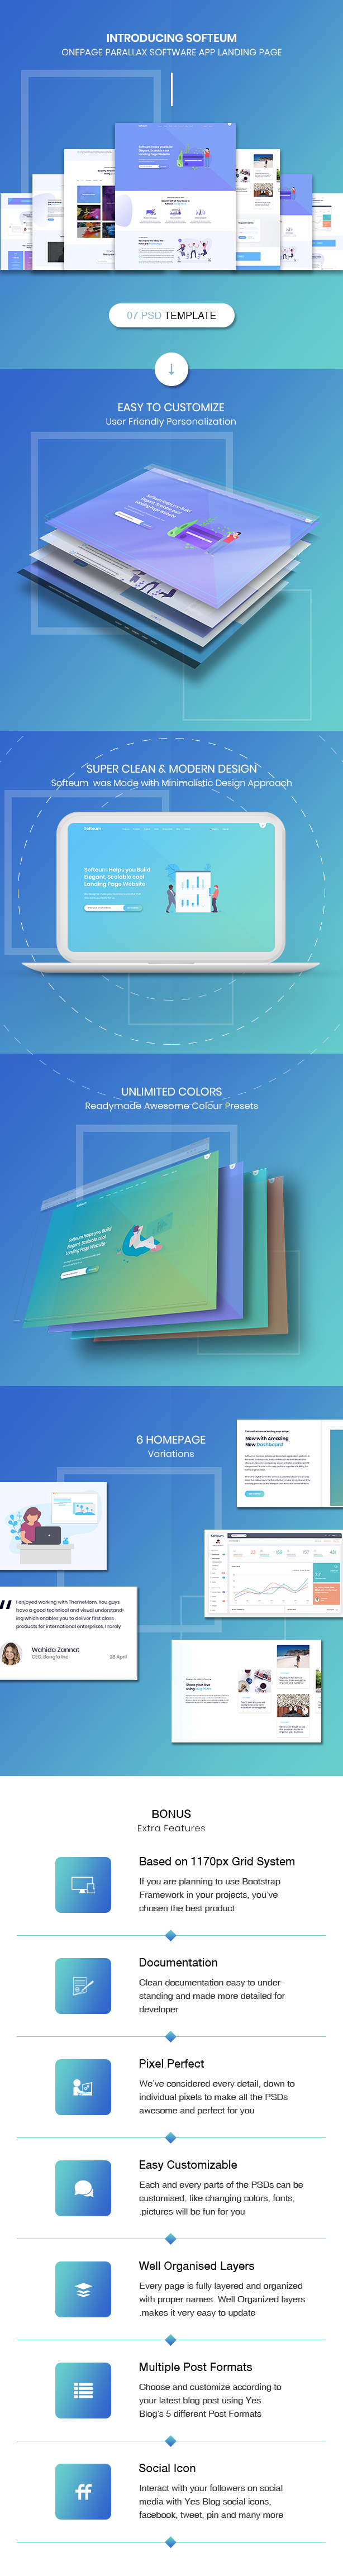 Softeum - Software, App & Product Showcase Landing PSD Design